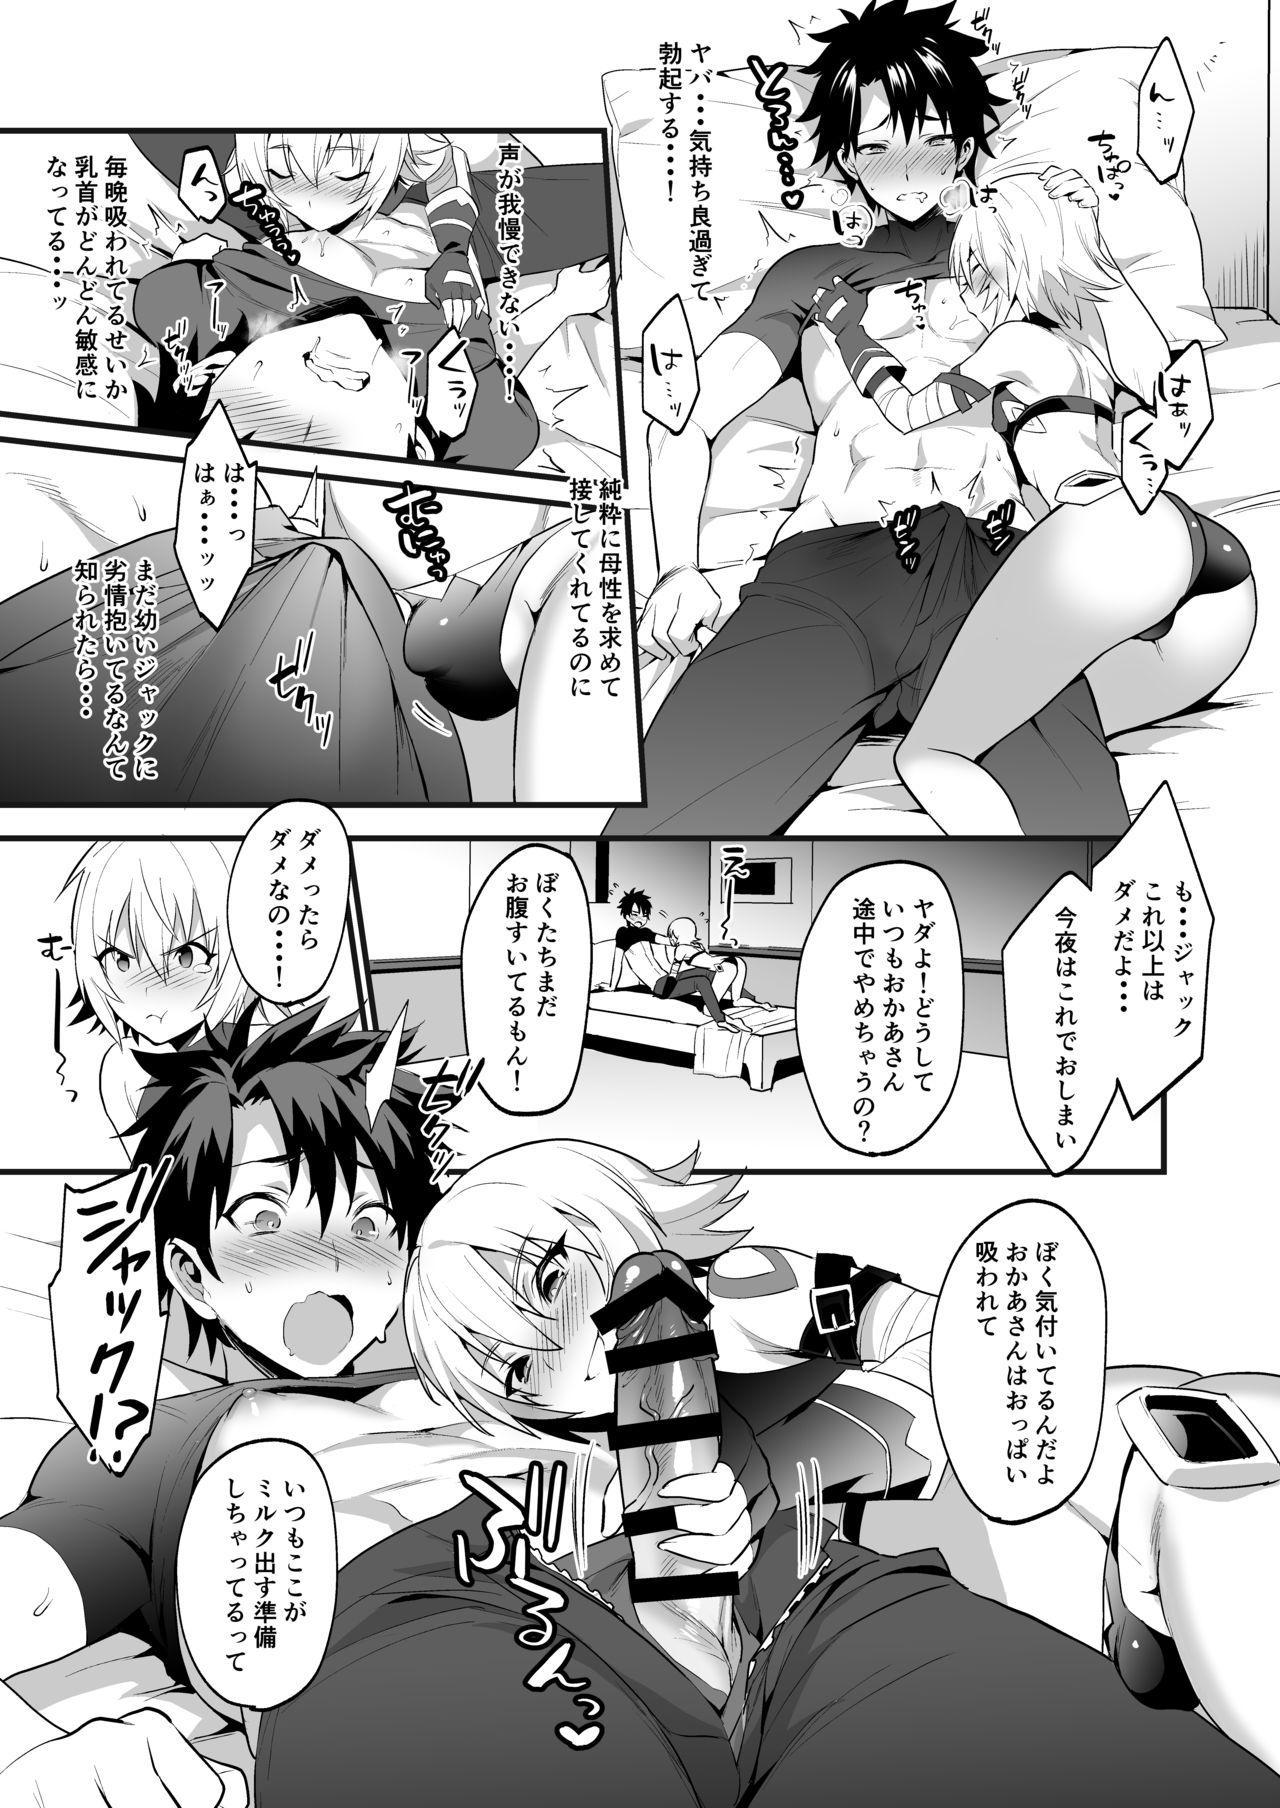 [Morittokoke (Morikoke)] Jack-kun wa Okaa-san to Issho (Fate/Grand Order) [Digital] 8